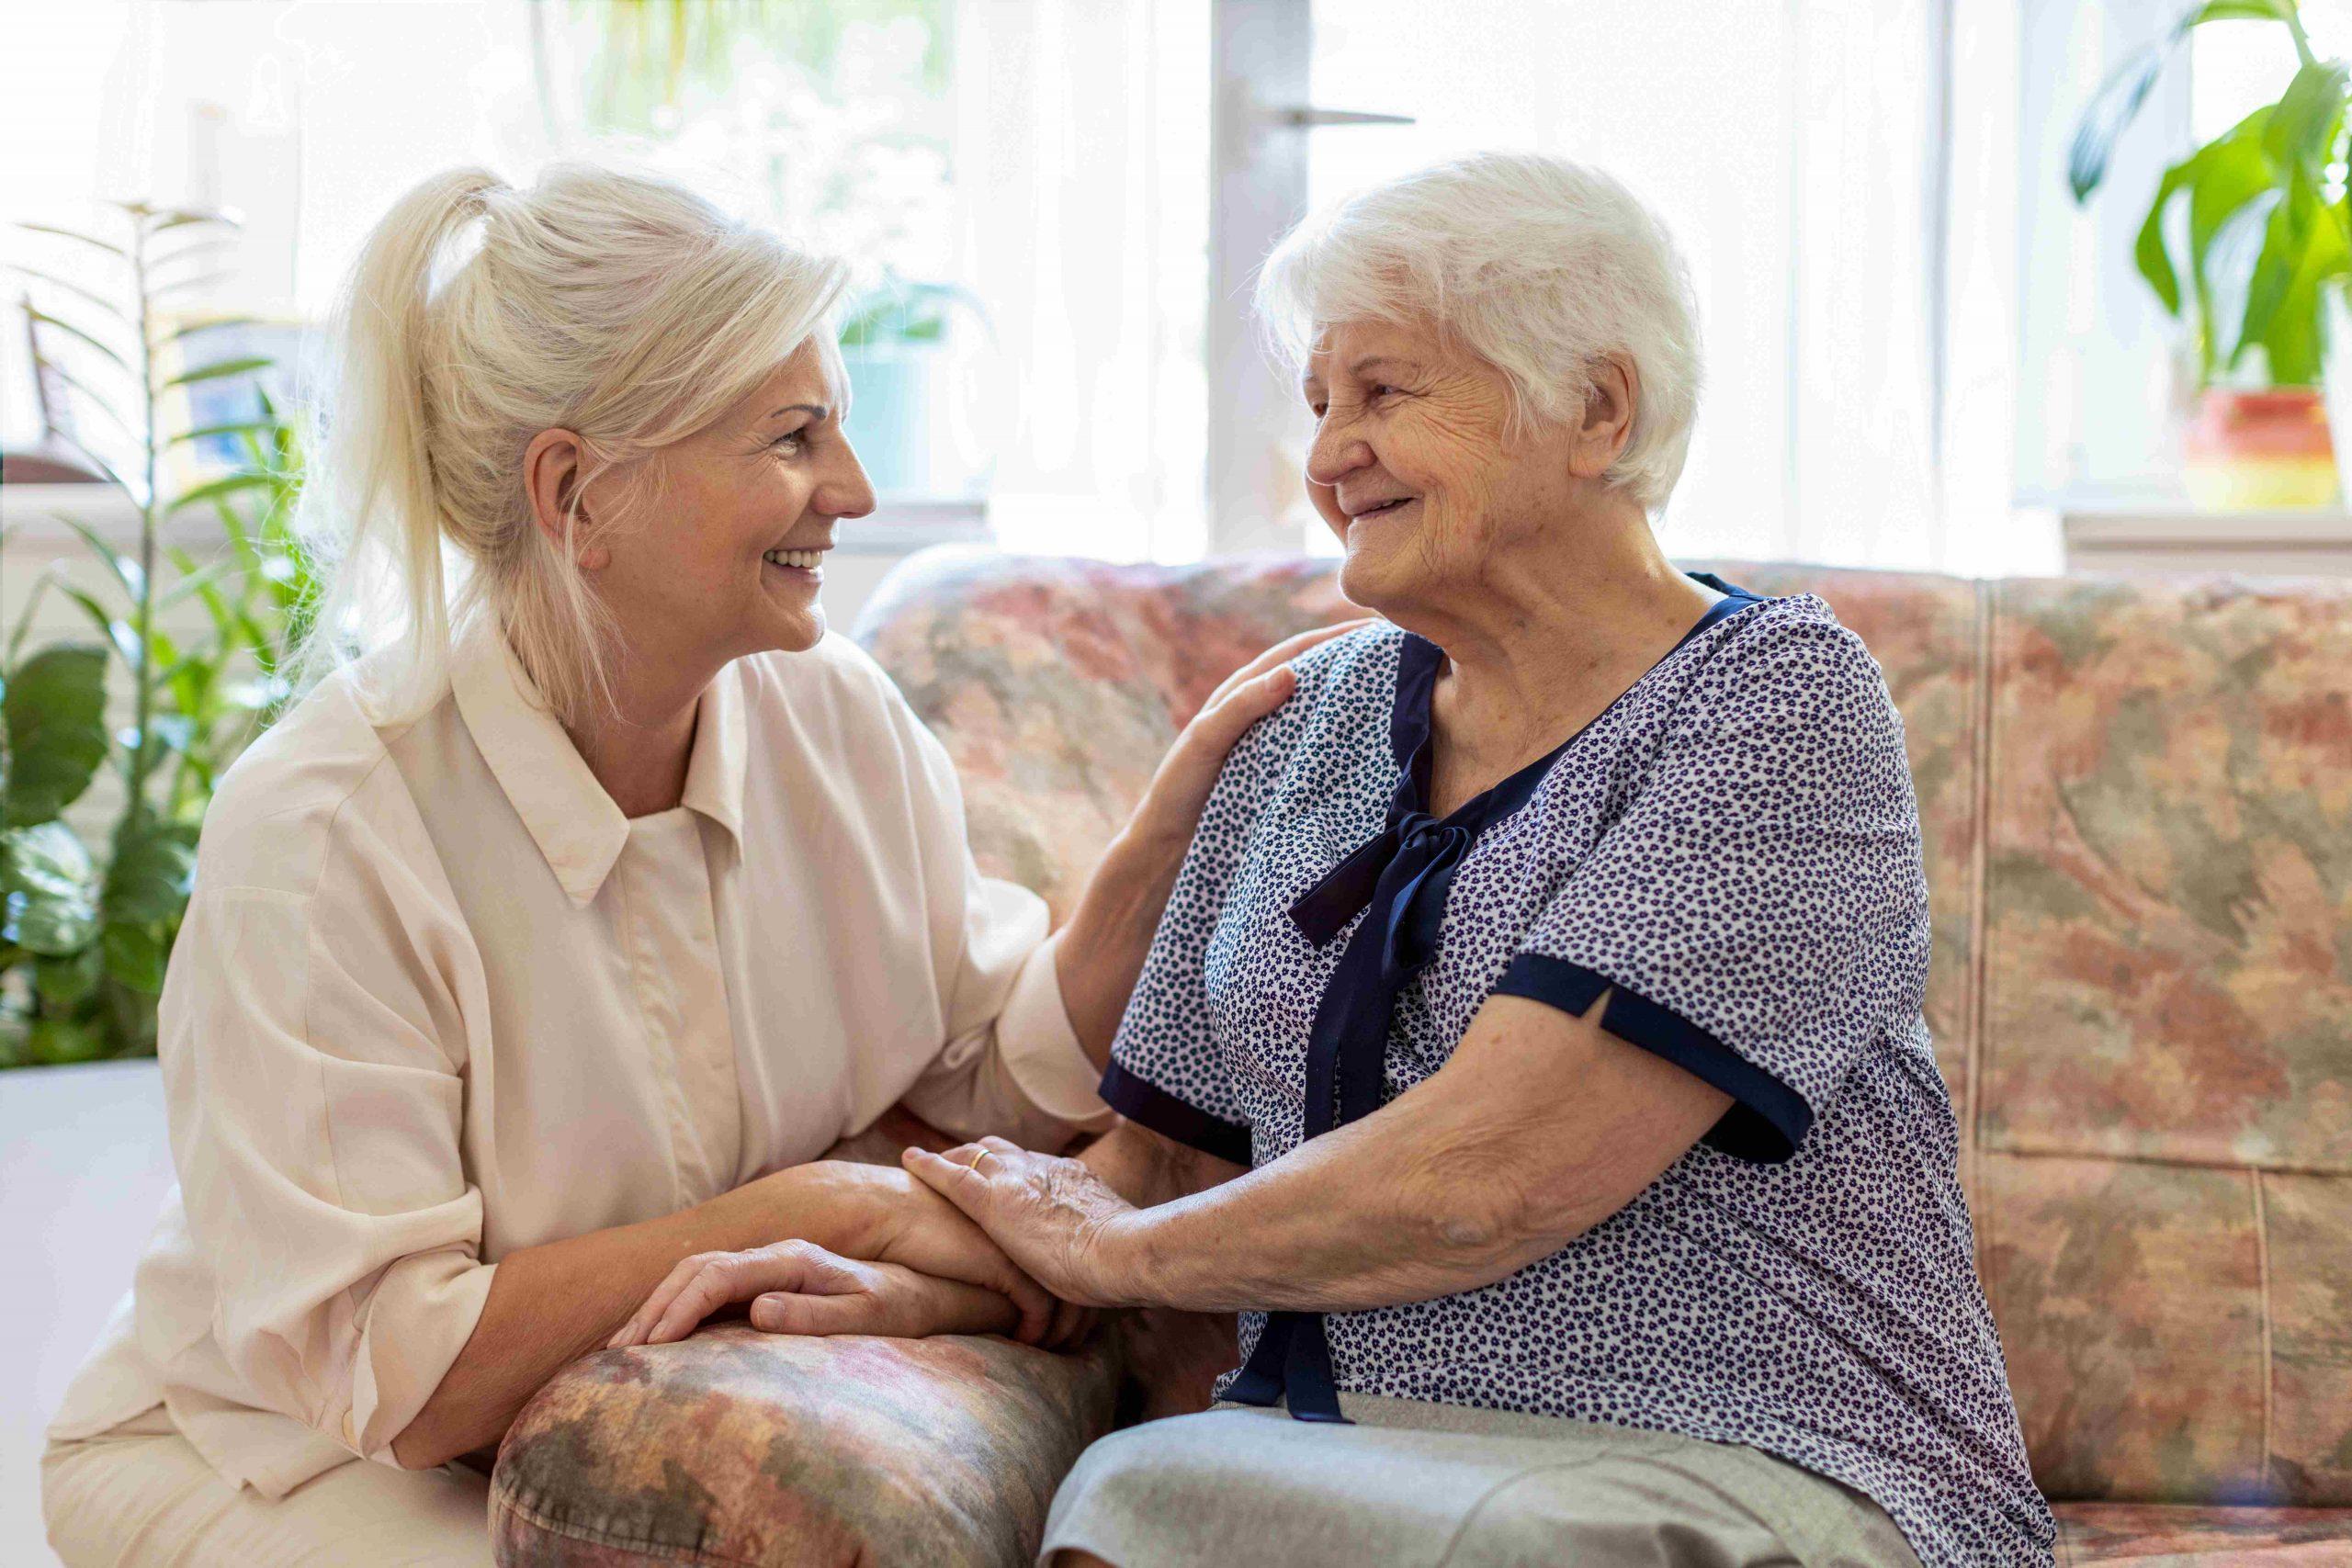 Malati di Alzheimer che vivono da soli